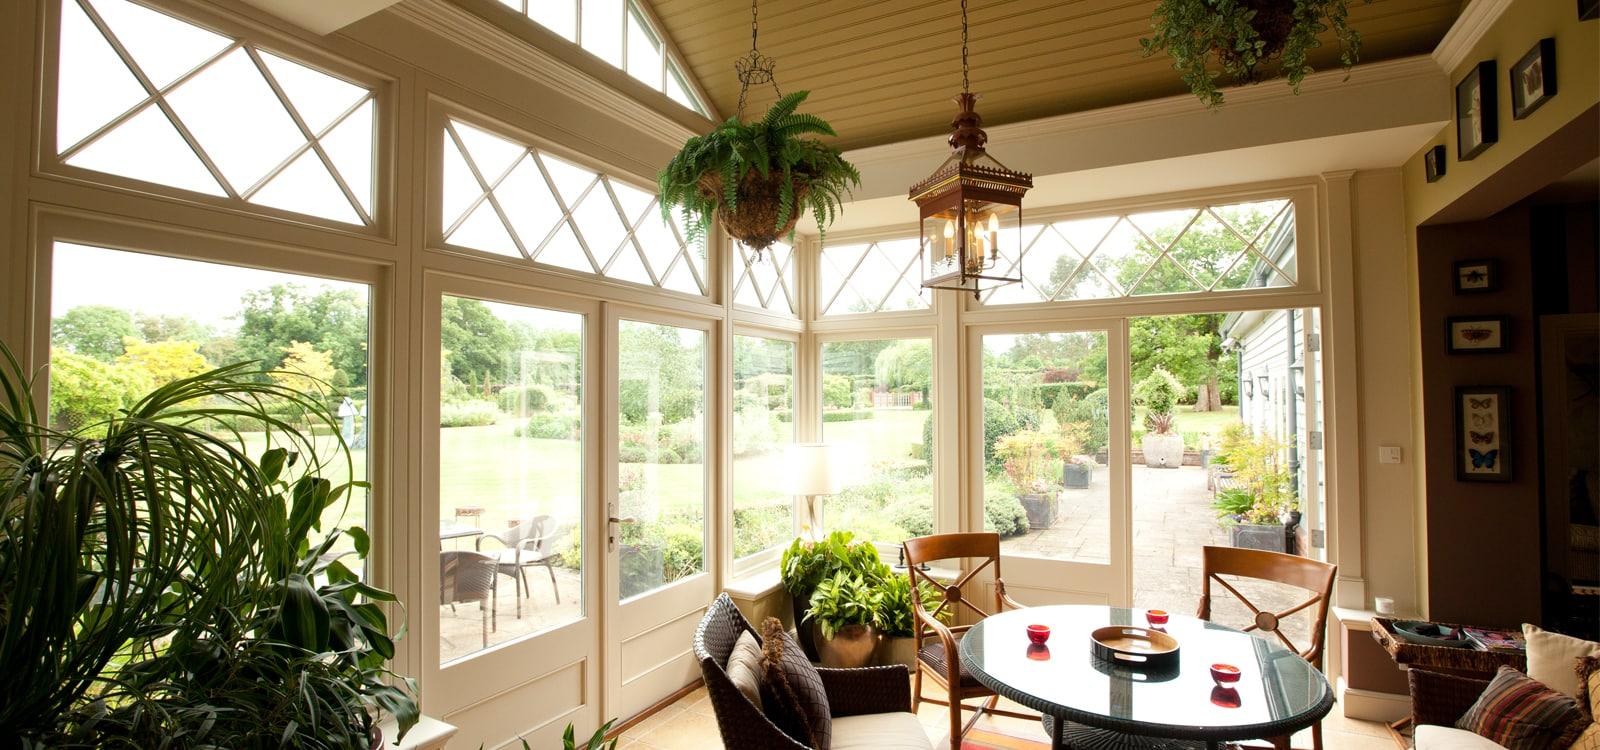 Best summer houseplants for your garden room extensions and orangeries